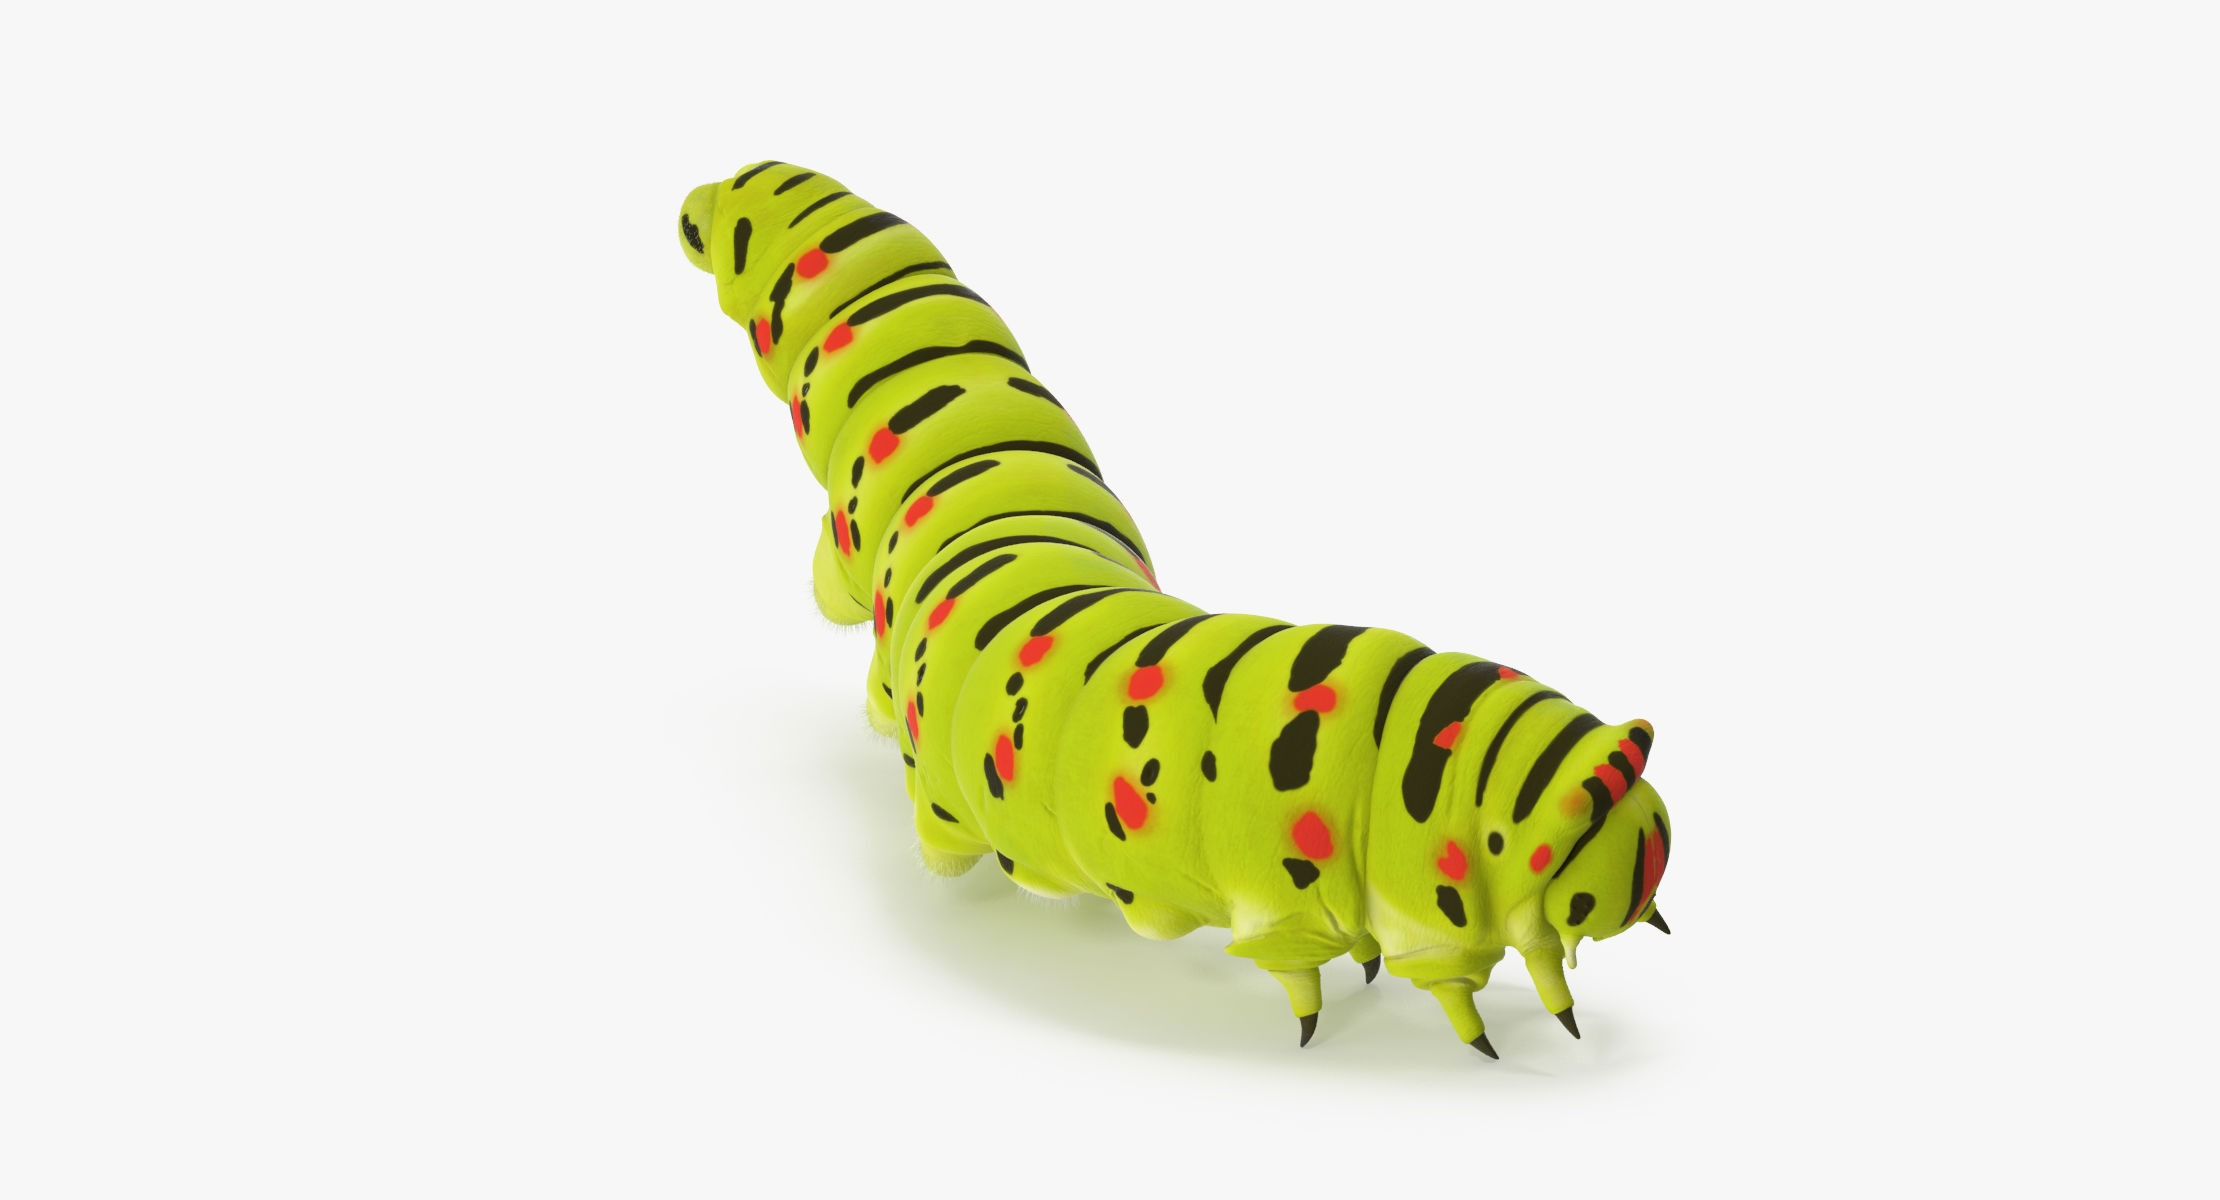 Caterpillar Climbing Down - reel 1